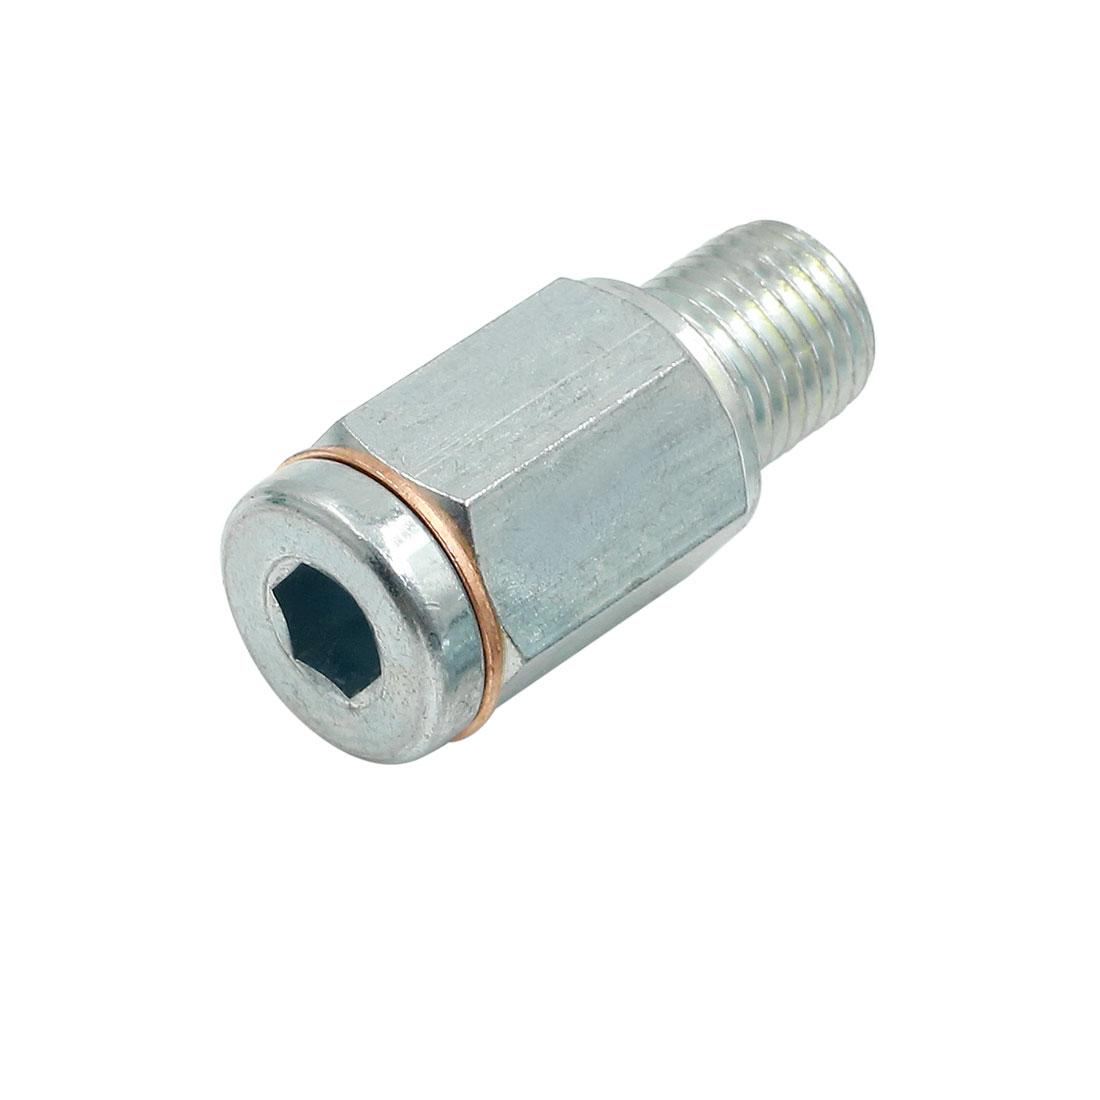 19 x 43mm Silver Tone Magnetic Engine Oil Pan Drain Plug Bolt for Auto Car